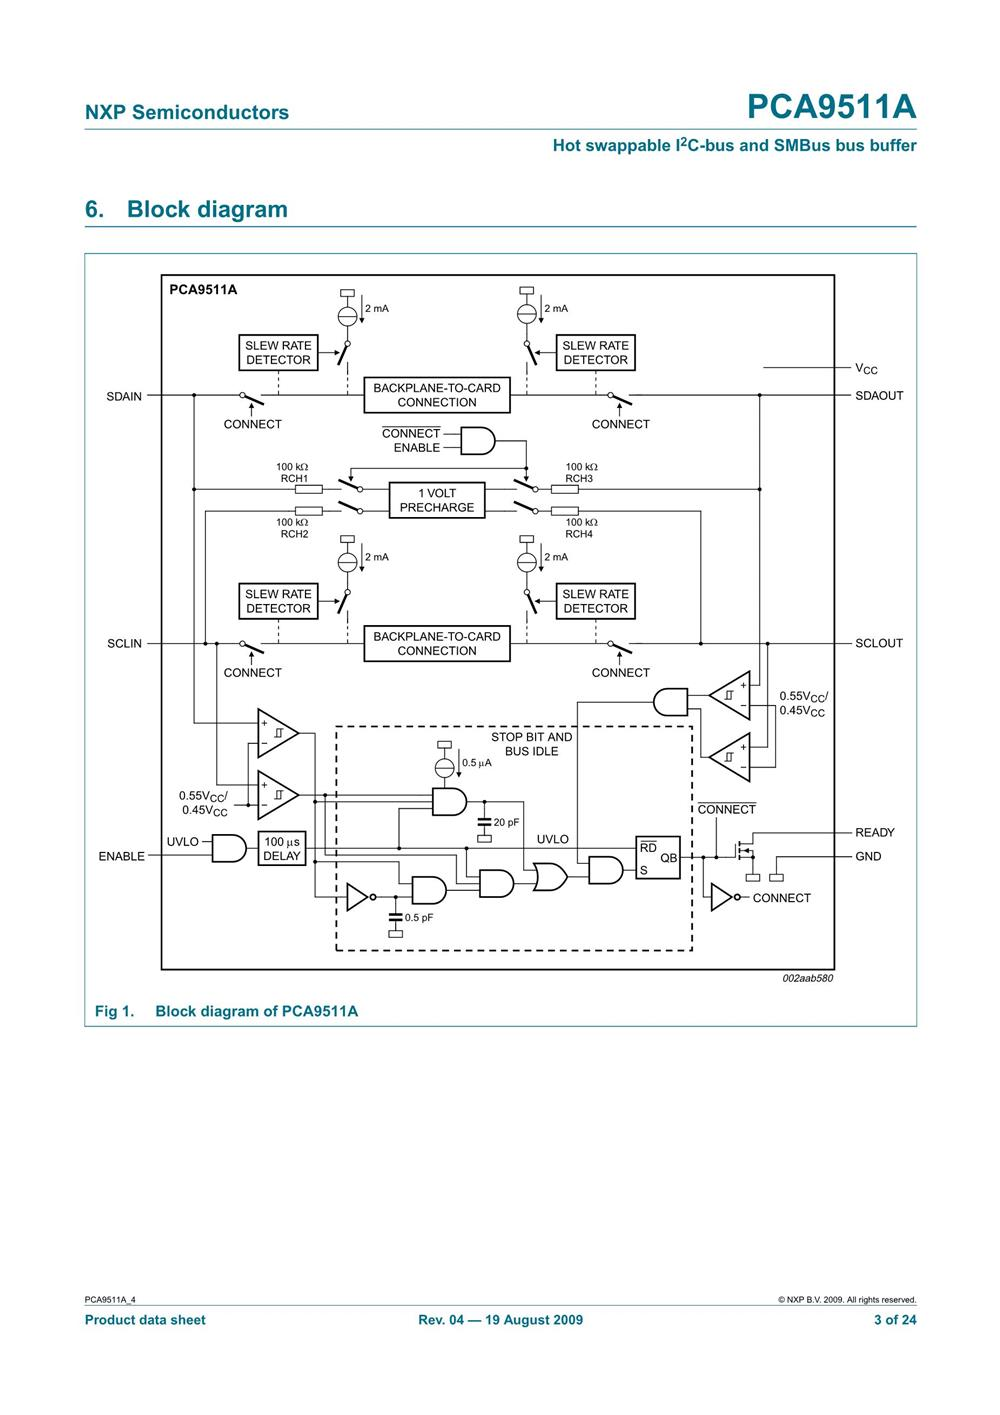 PCA9511ADP,118's pdf picture 3